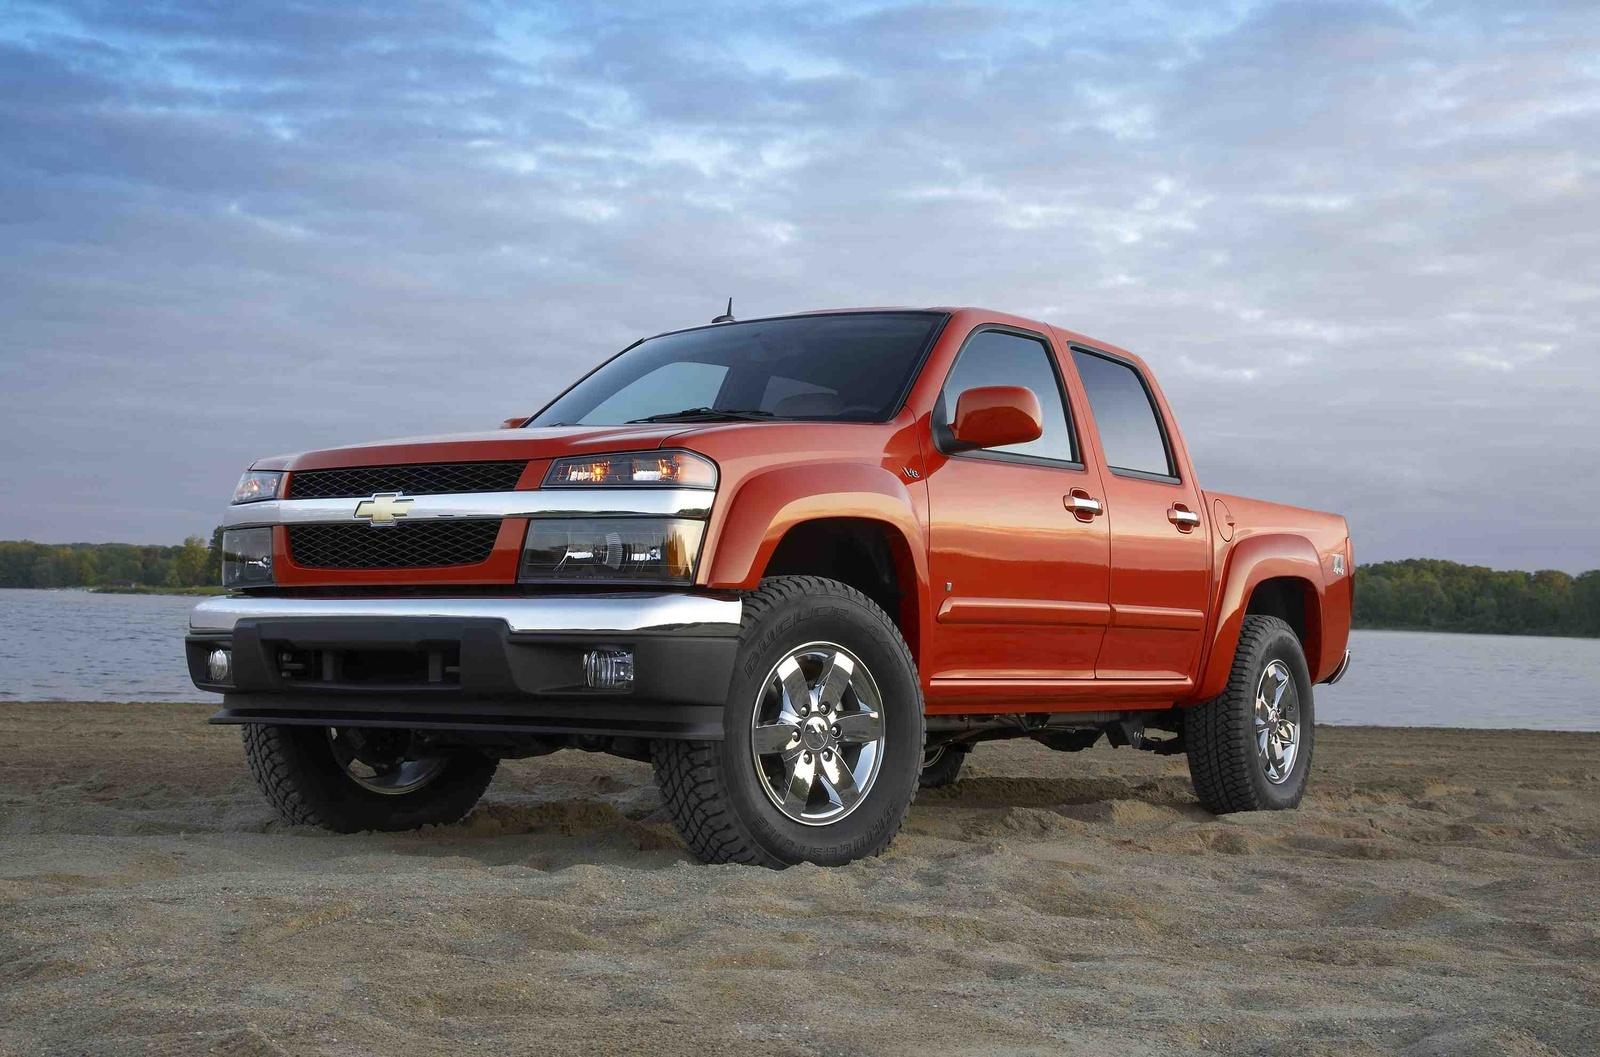 2009 Chevrolet Colorado - Overview